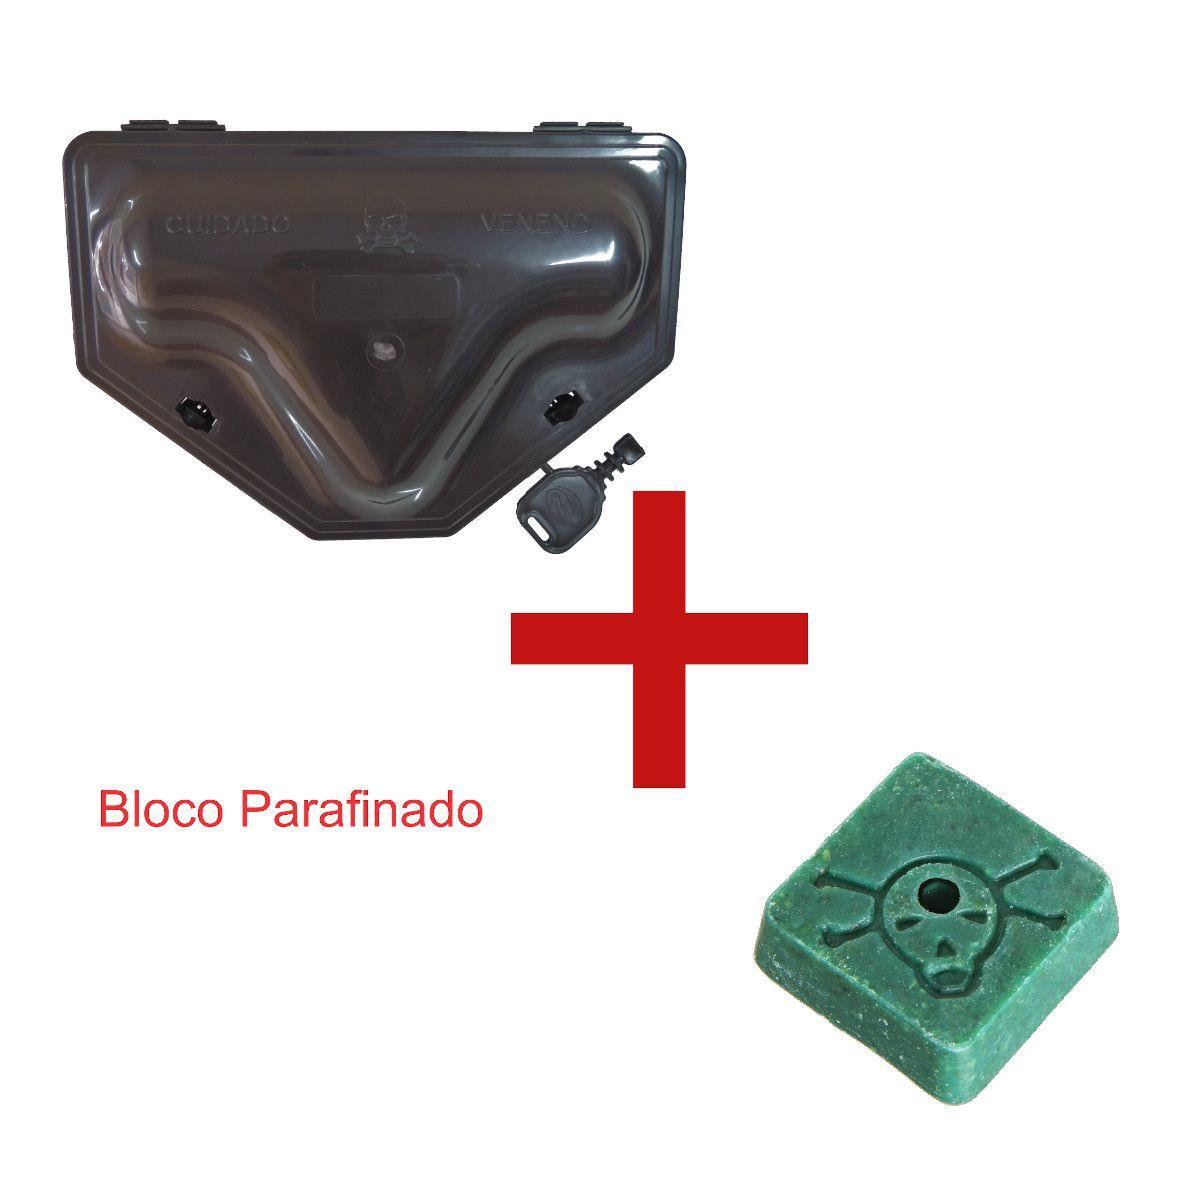 KIT 25 Porta Iscas Reforçado 2 TRAVAS Chave Ratoeira p/Ratos